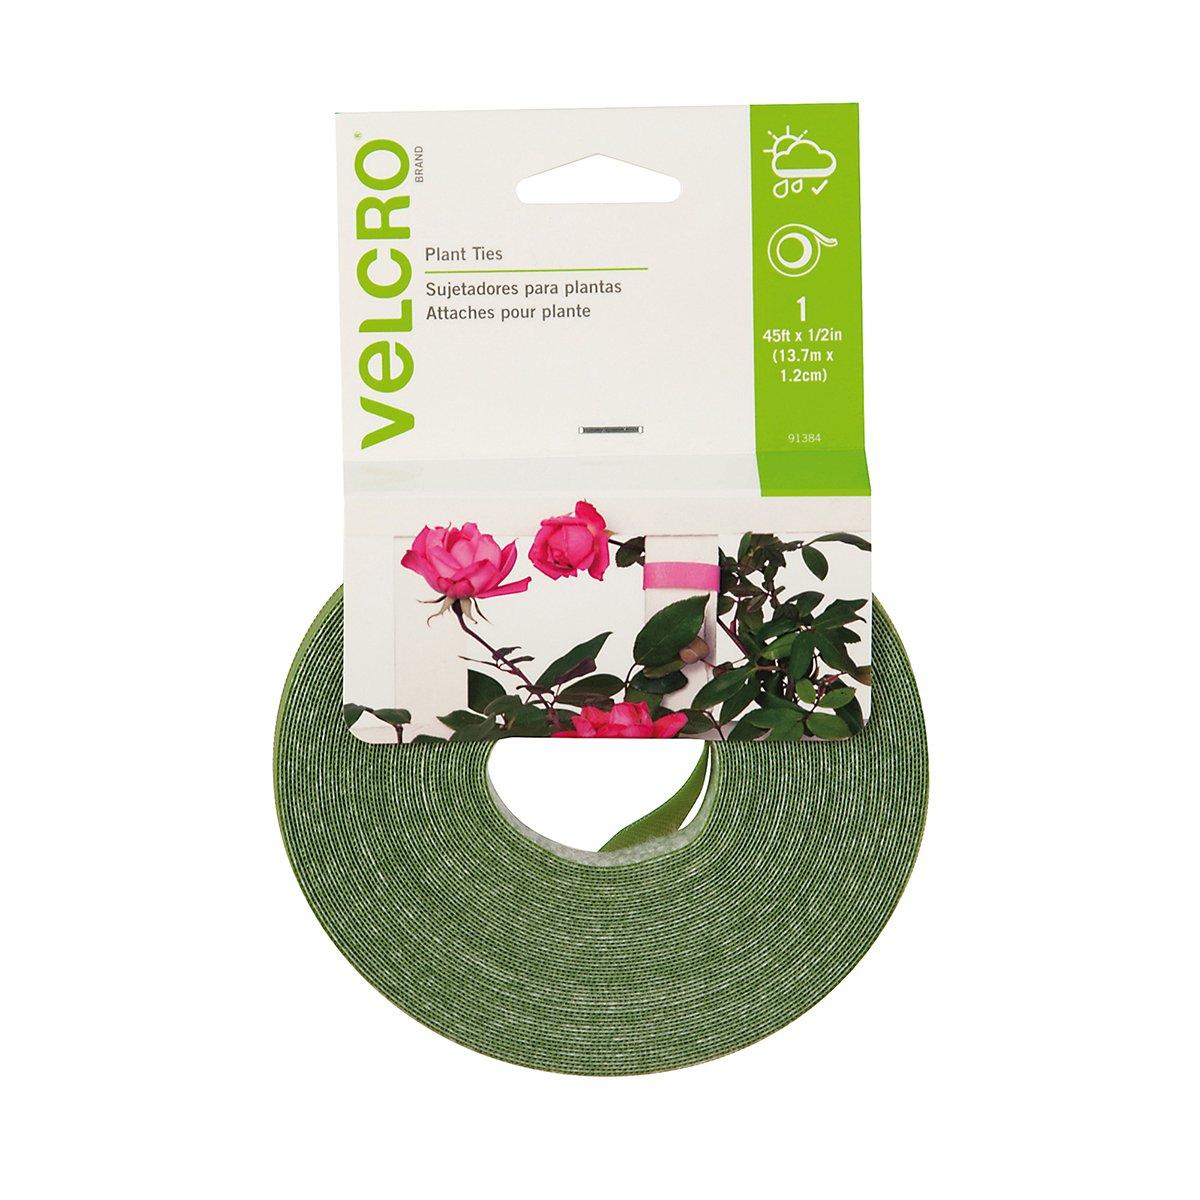 VELCRO Brand VPTG Velcro 1 2-Inch x 45-Foot Ties Plant Tie